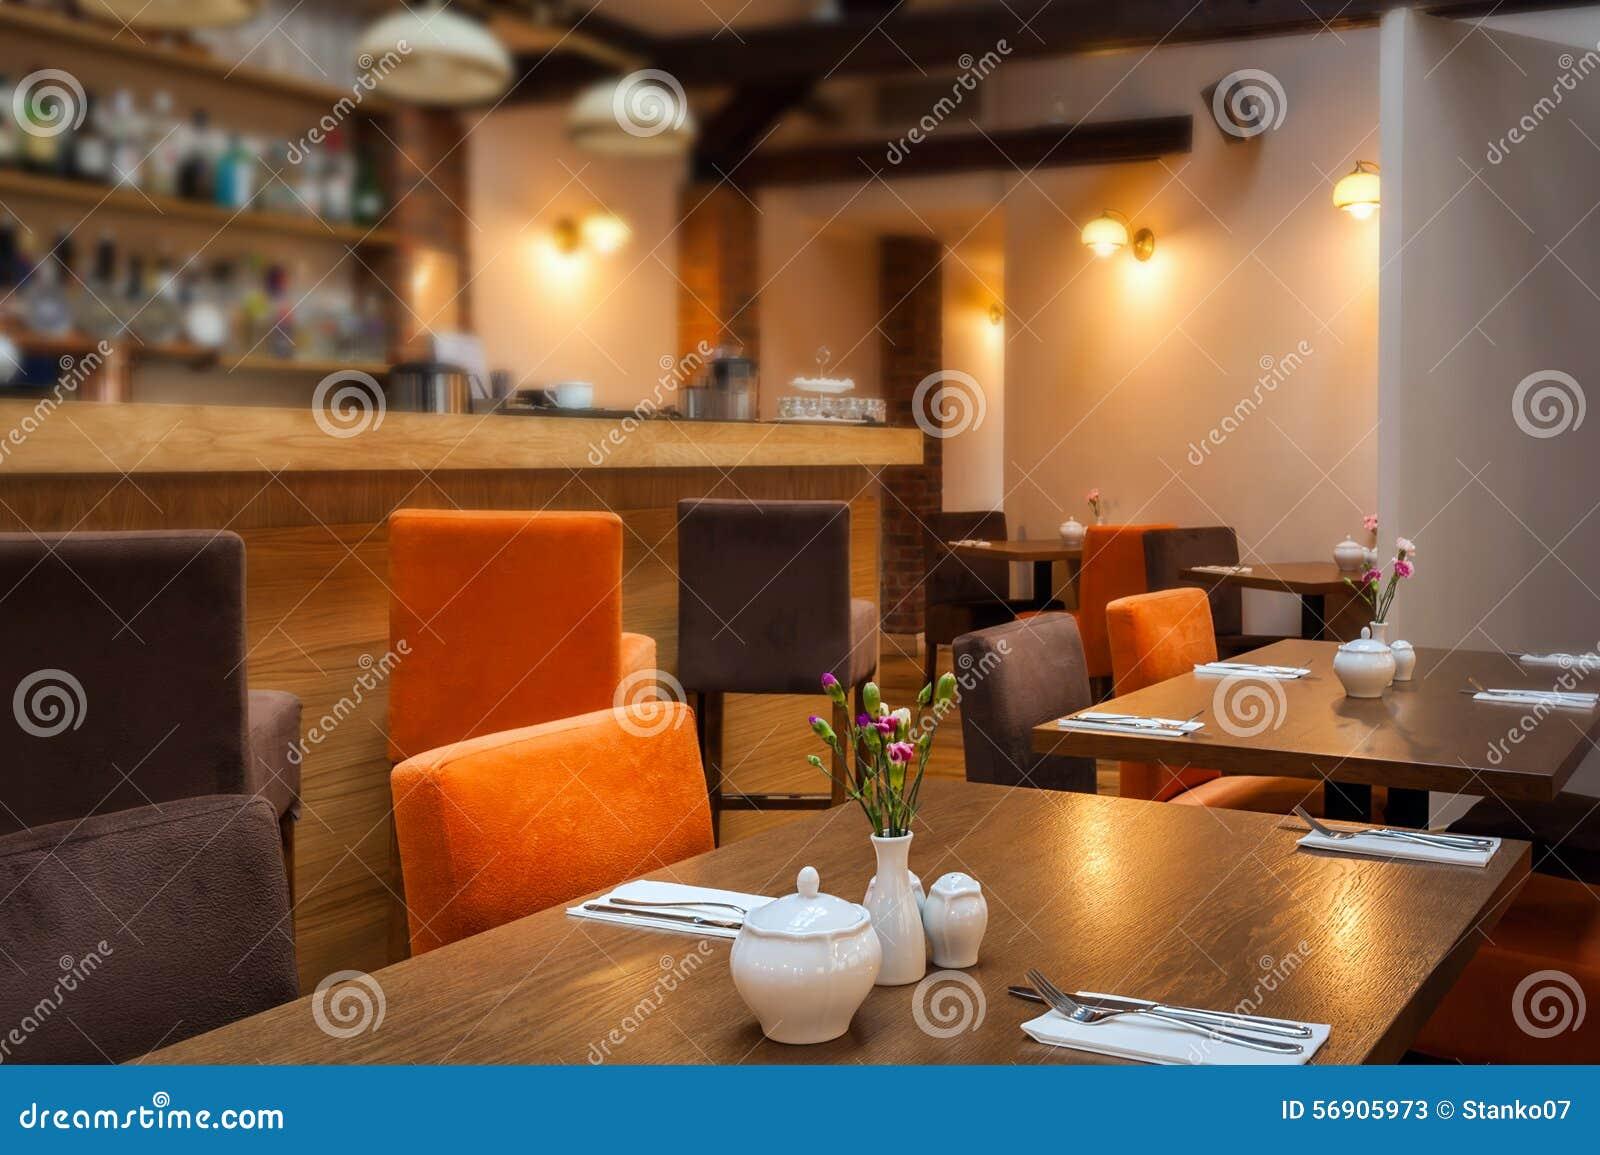 restaurant interior stock photo - image: 56905973